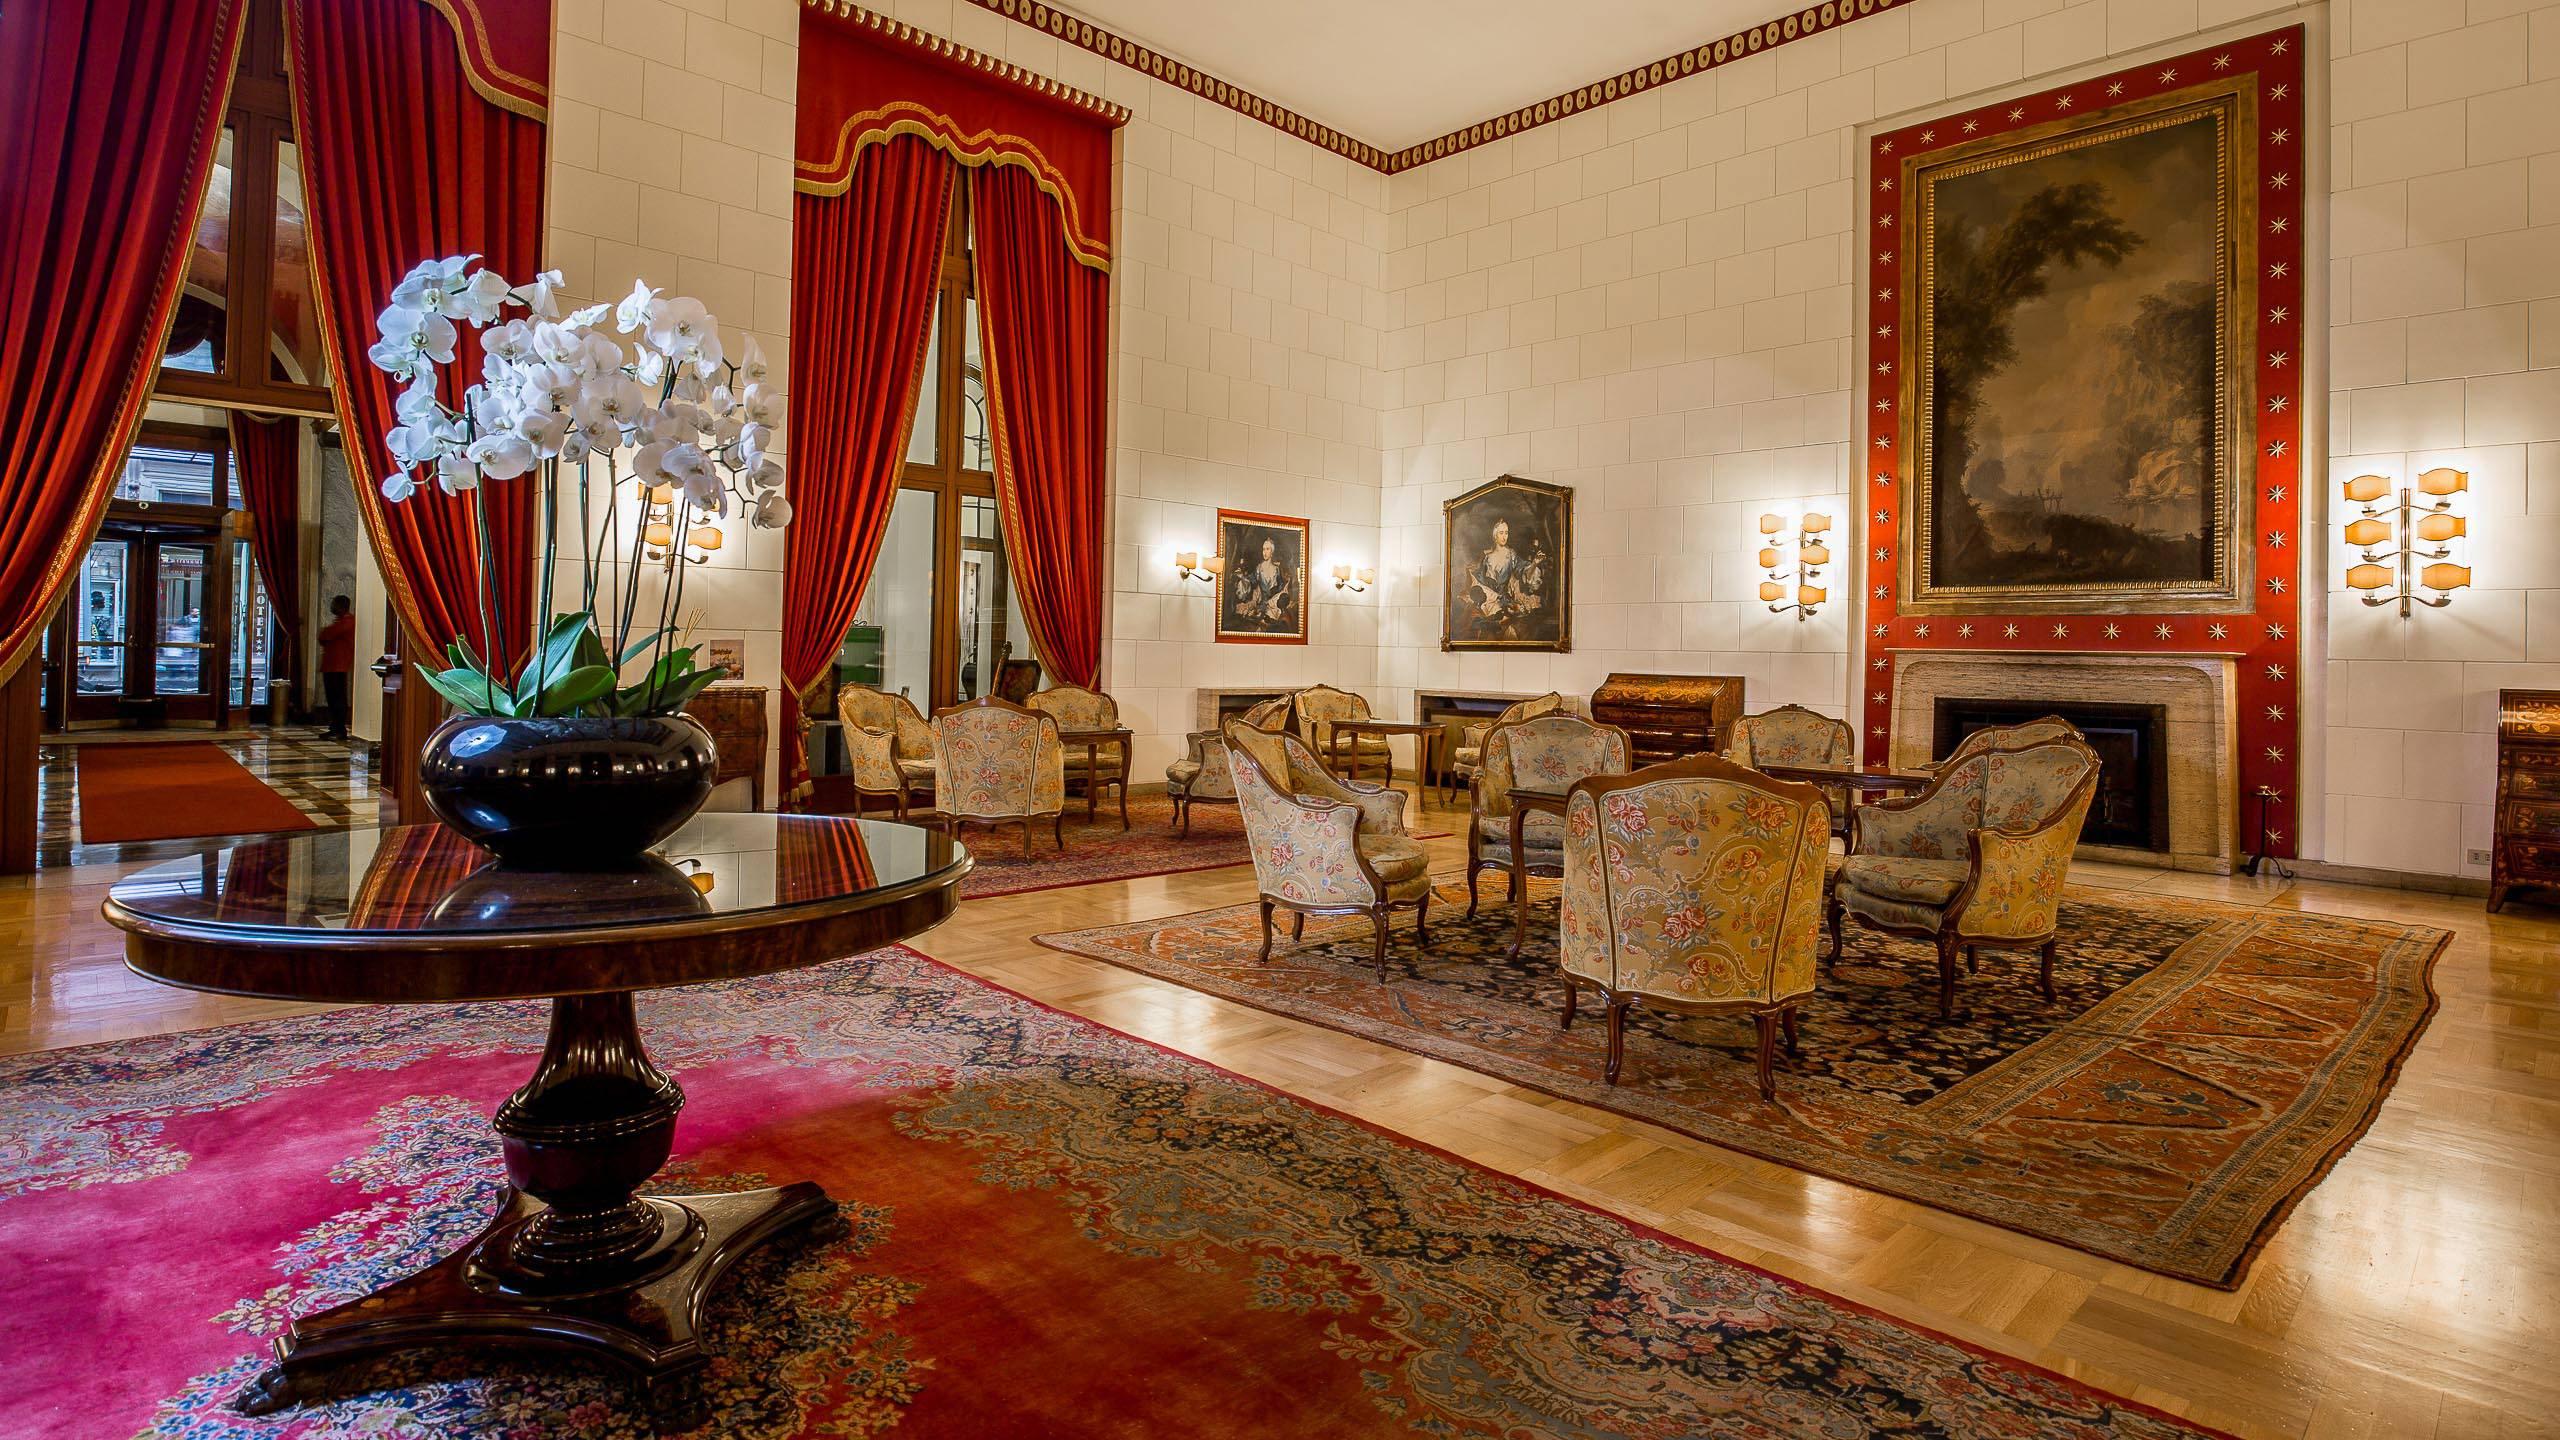 Hotel-Quirinale-Rome-hall-0118